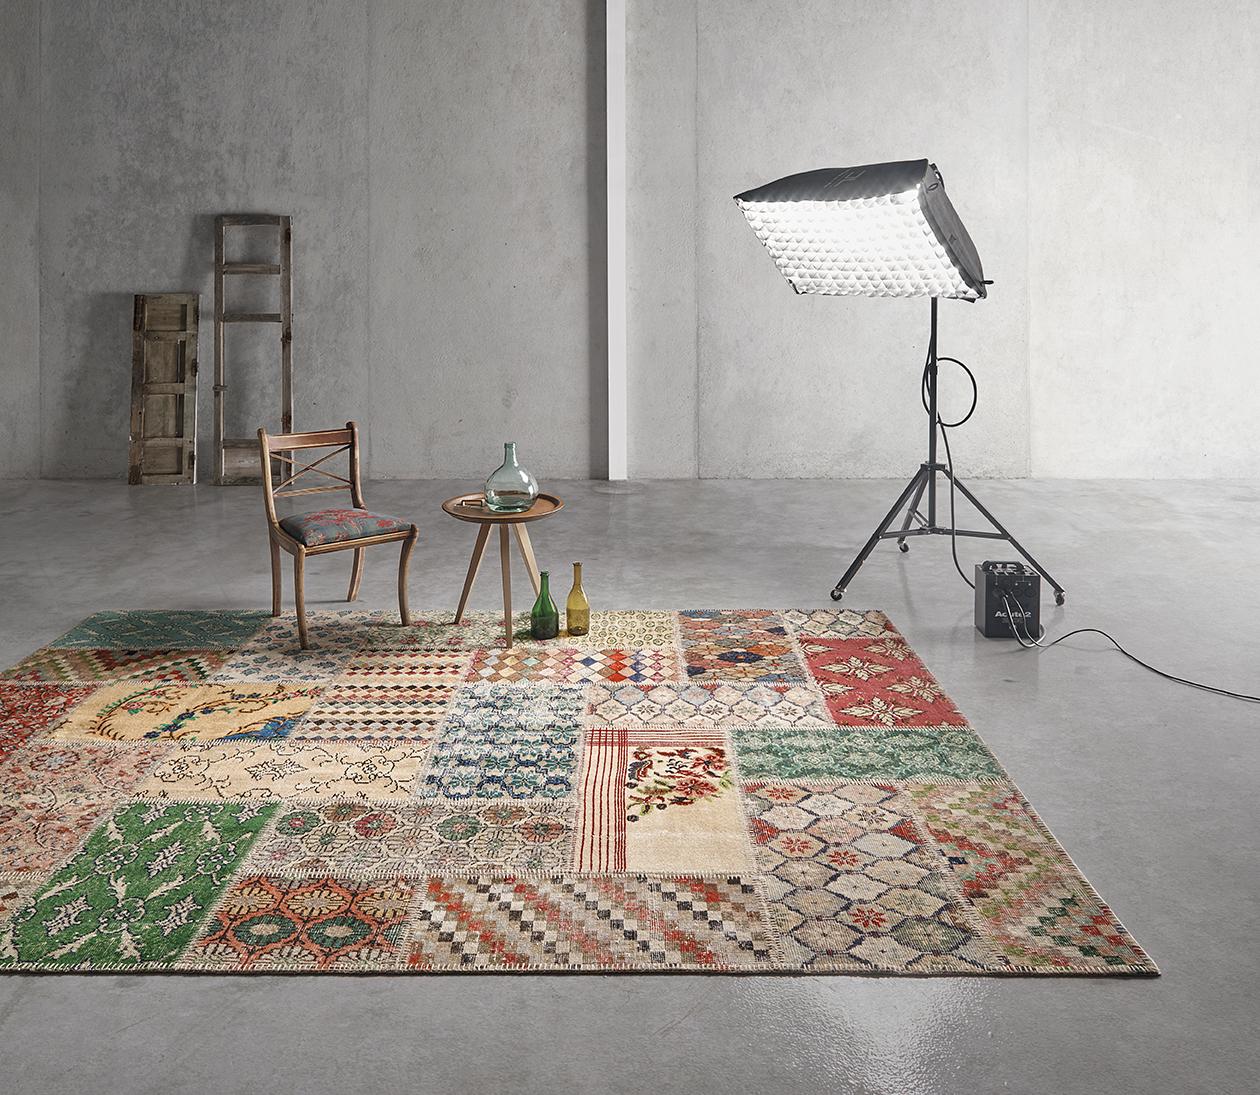 Alfombras patchwork, producto artesanal